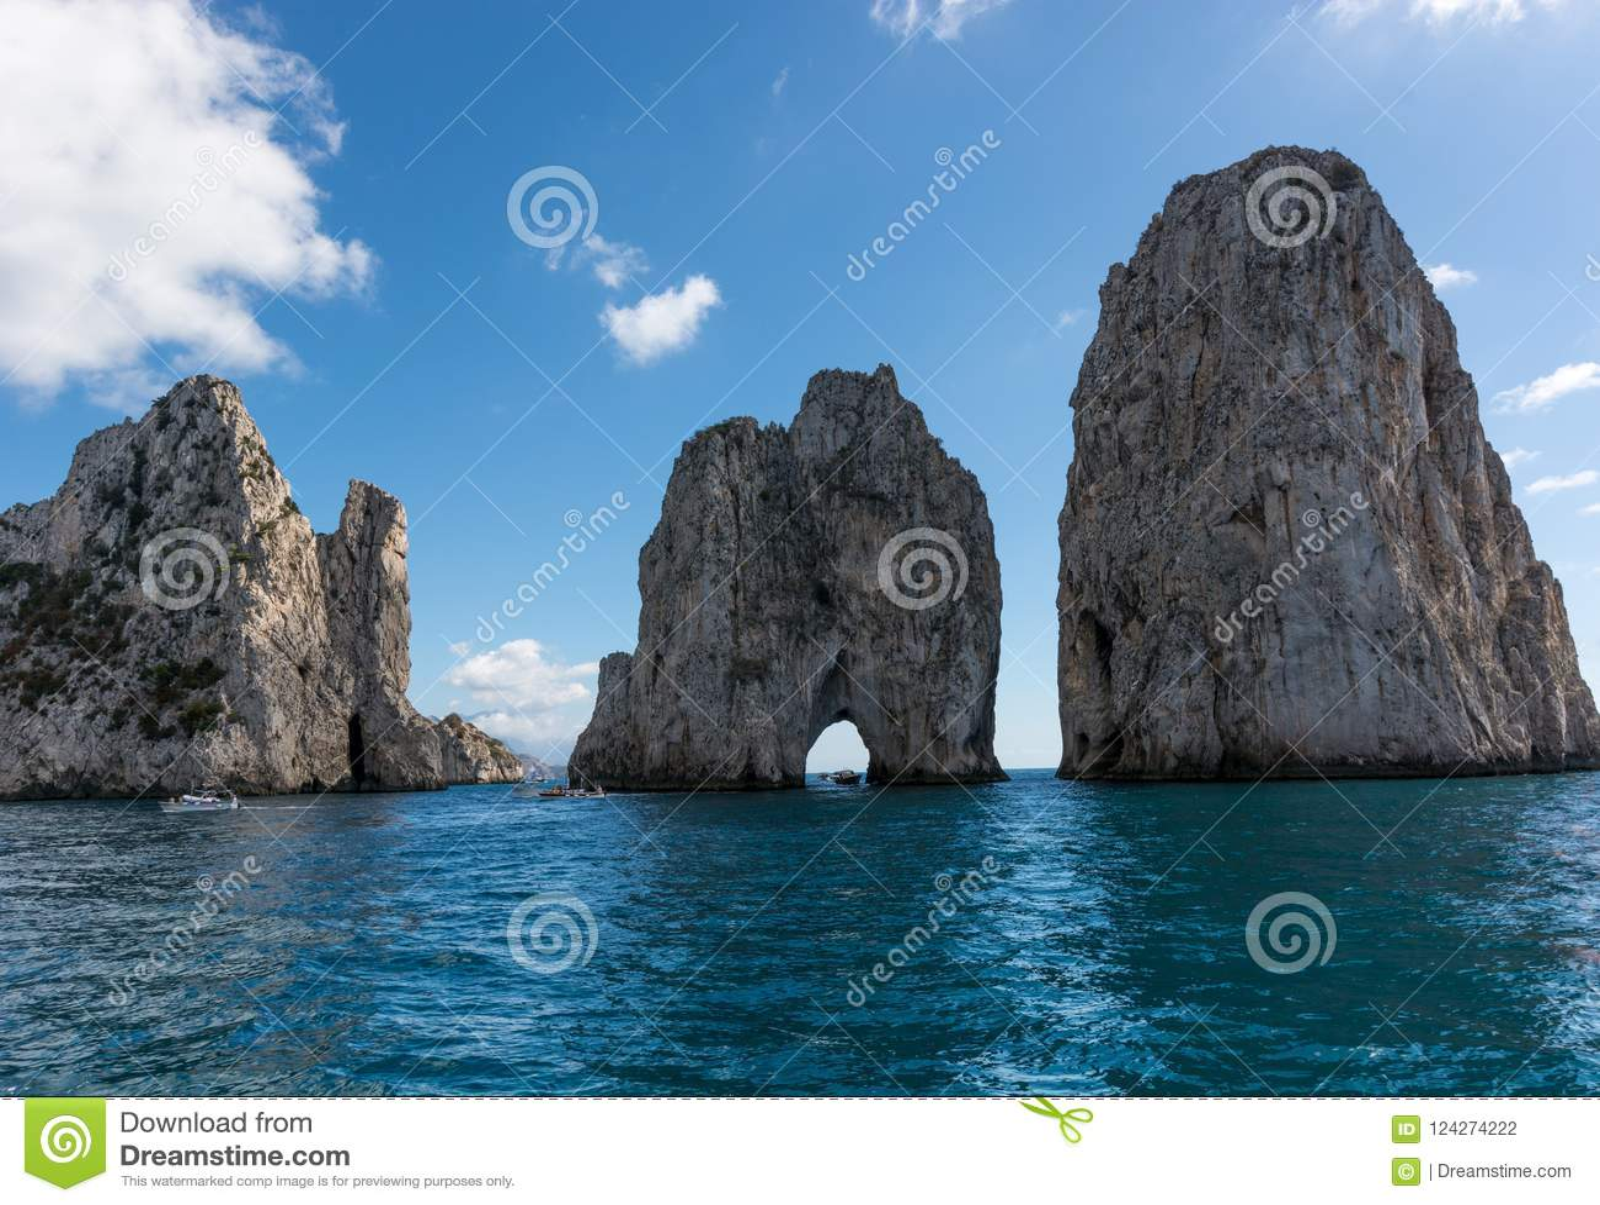 Faraglioni van Capri, het symbool van het eiland, in guf od Napels, Campania, Italië wordt gevestigd dat